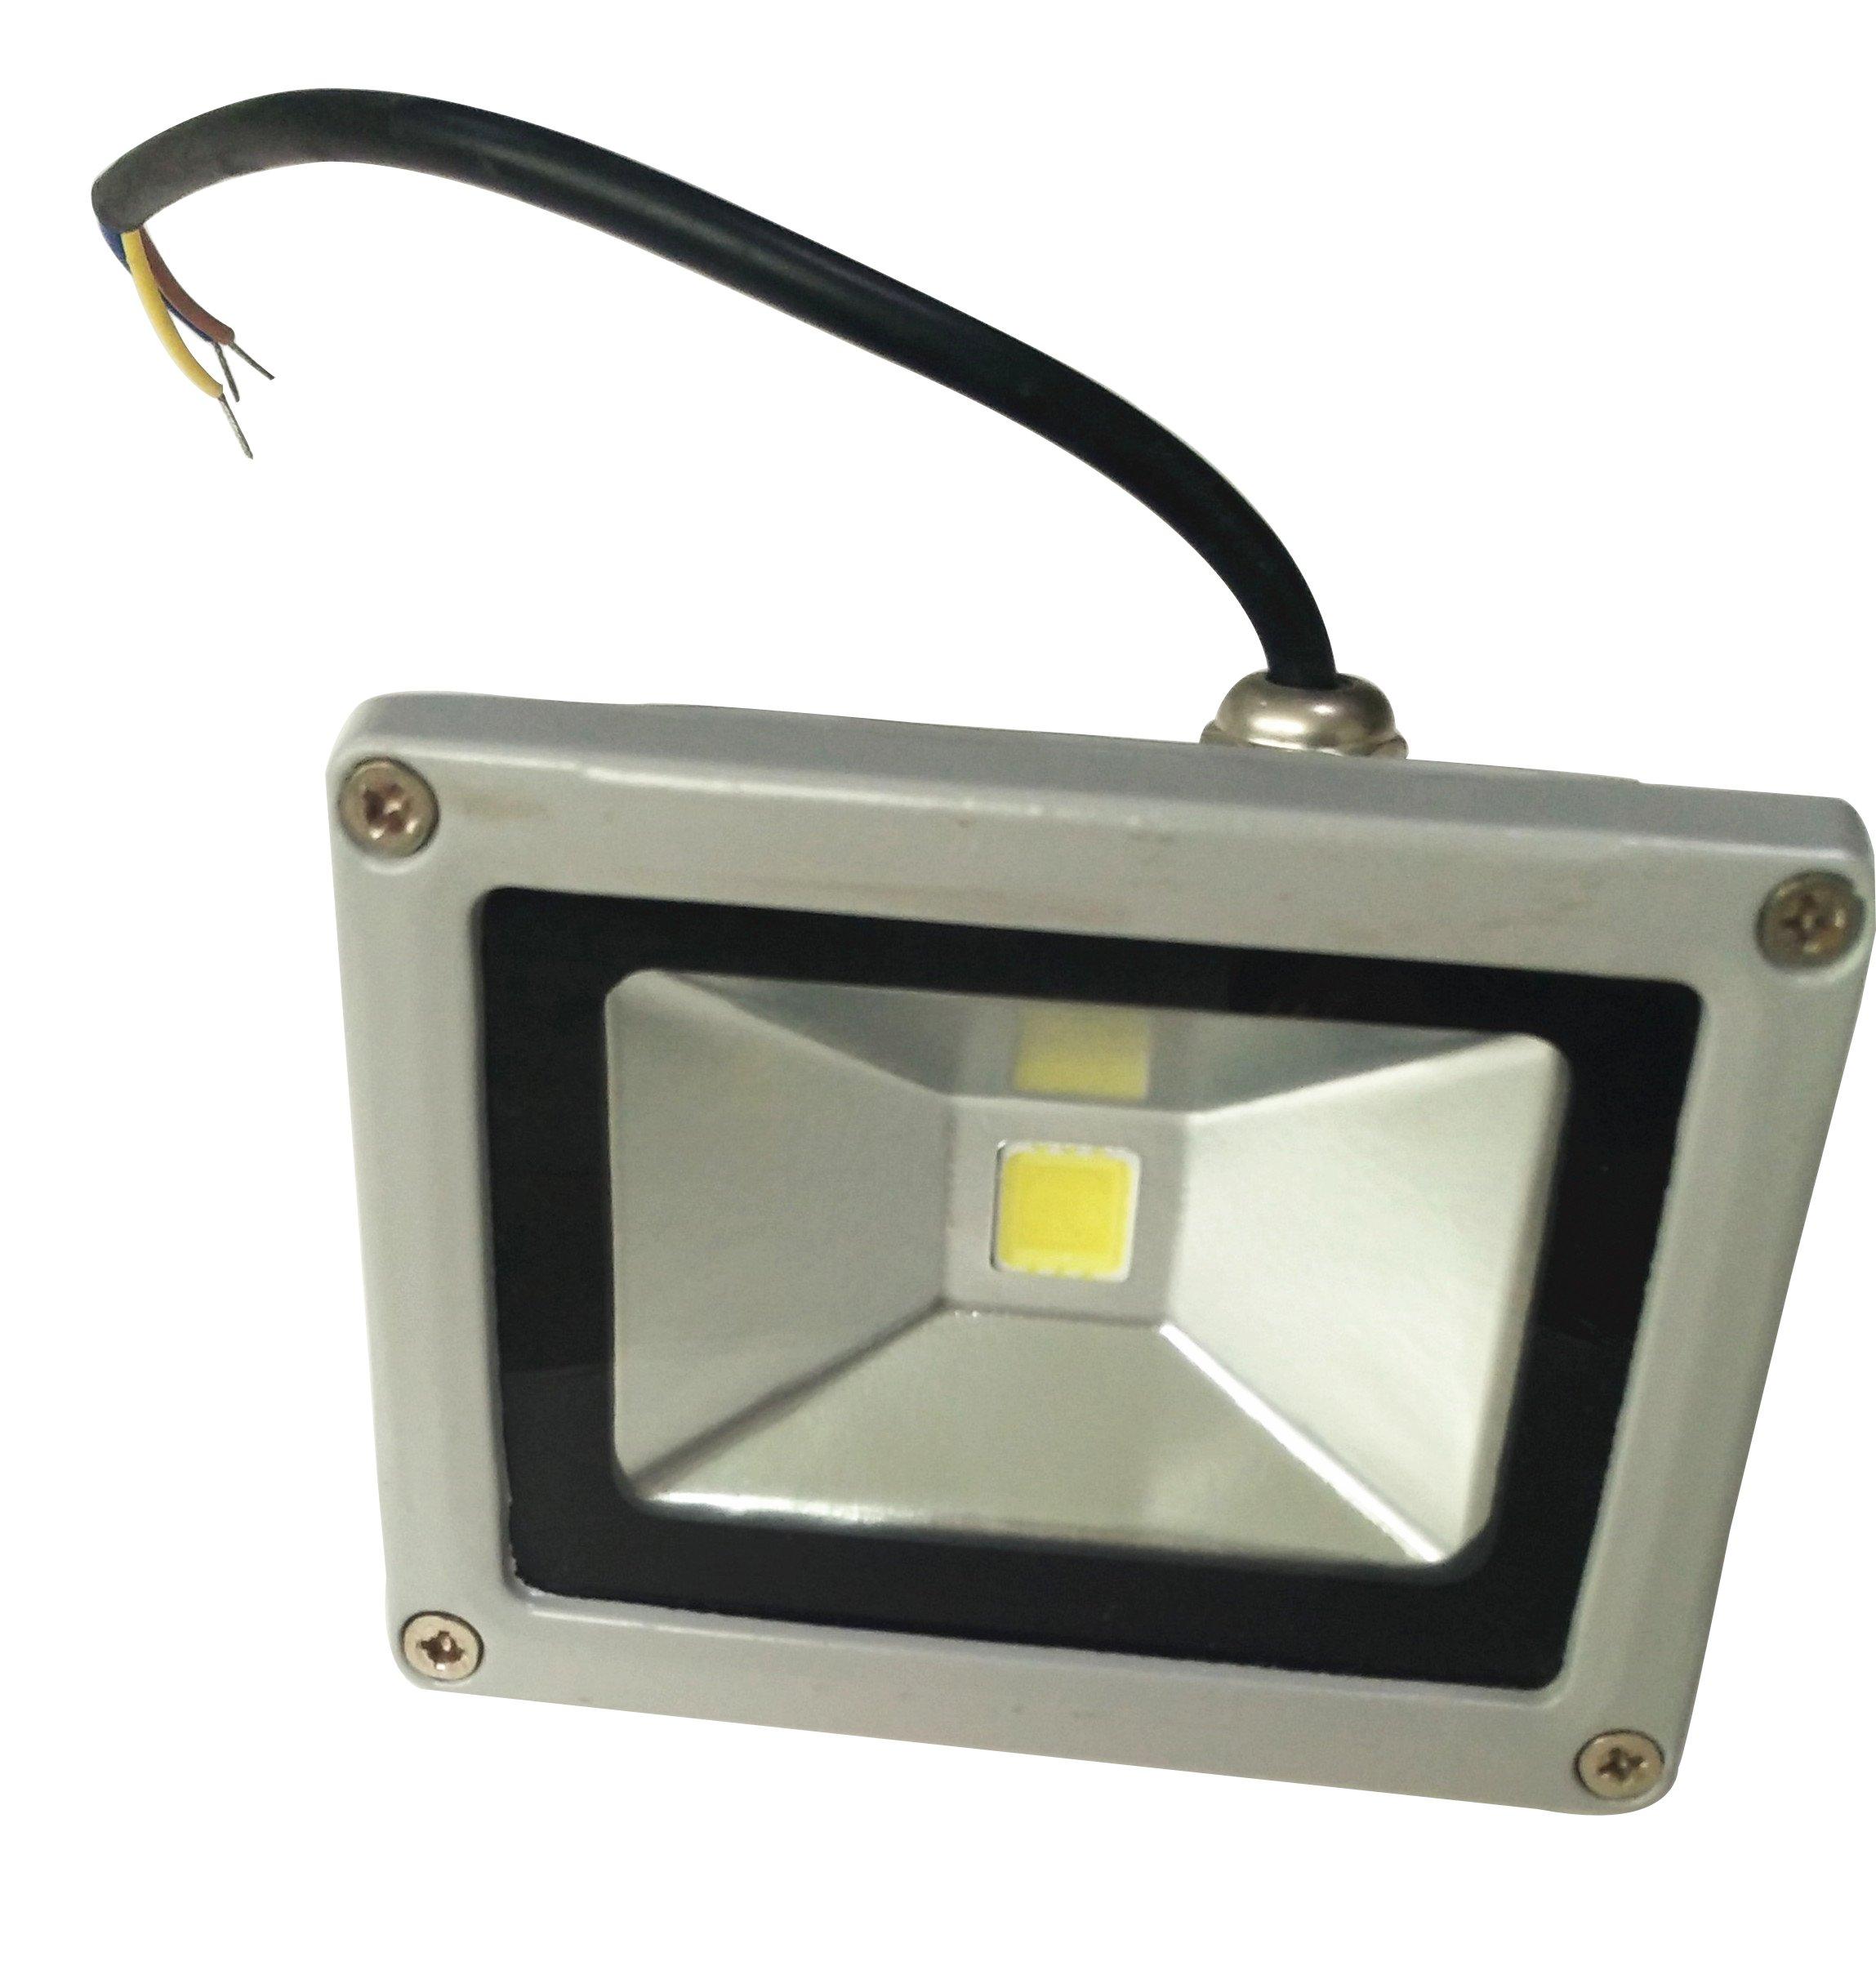 led world 10W High Power LED Floodlight Wall Wash UV Light 395nm Garden Outdoor AC/DC 12V